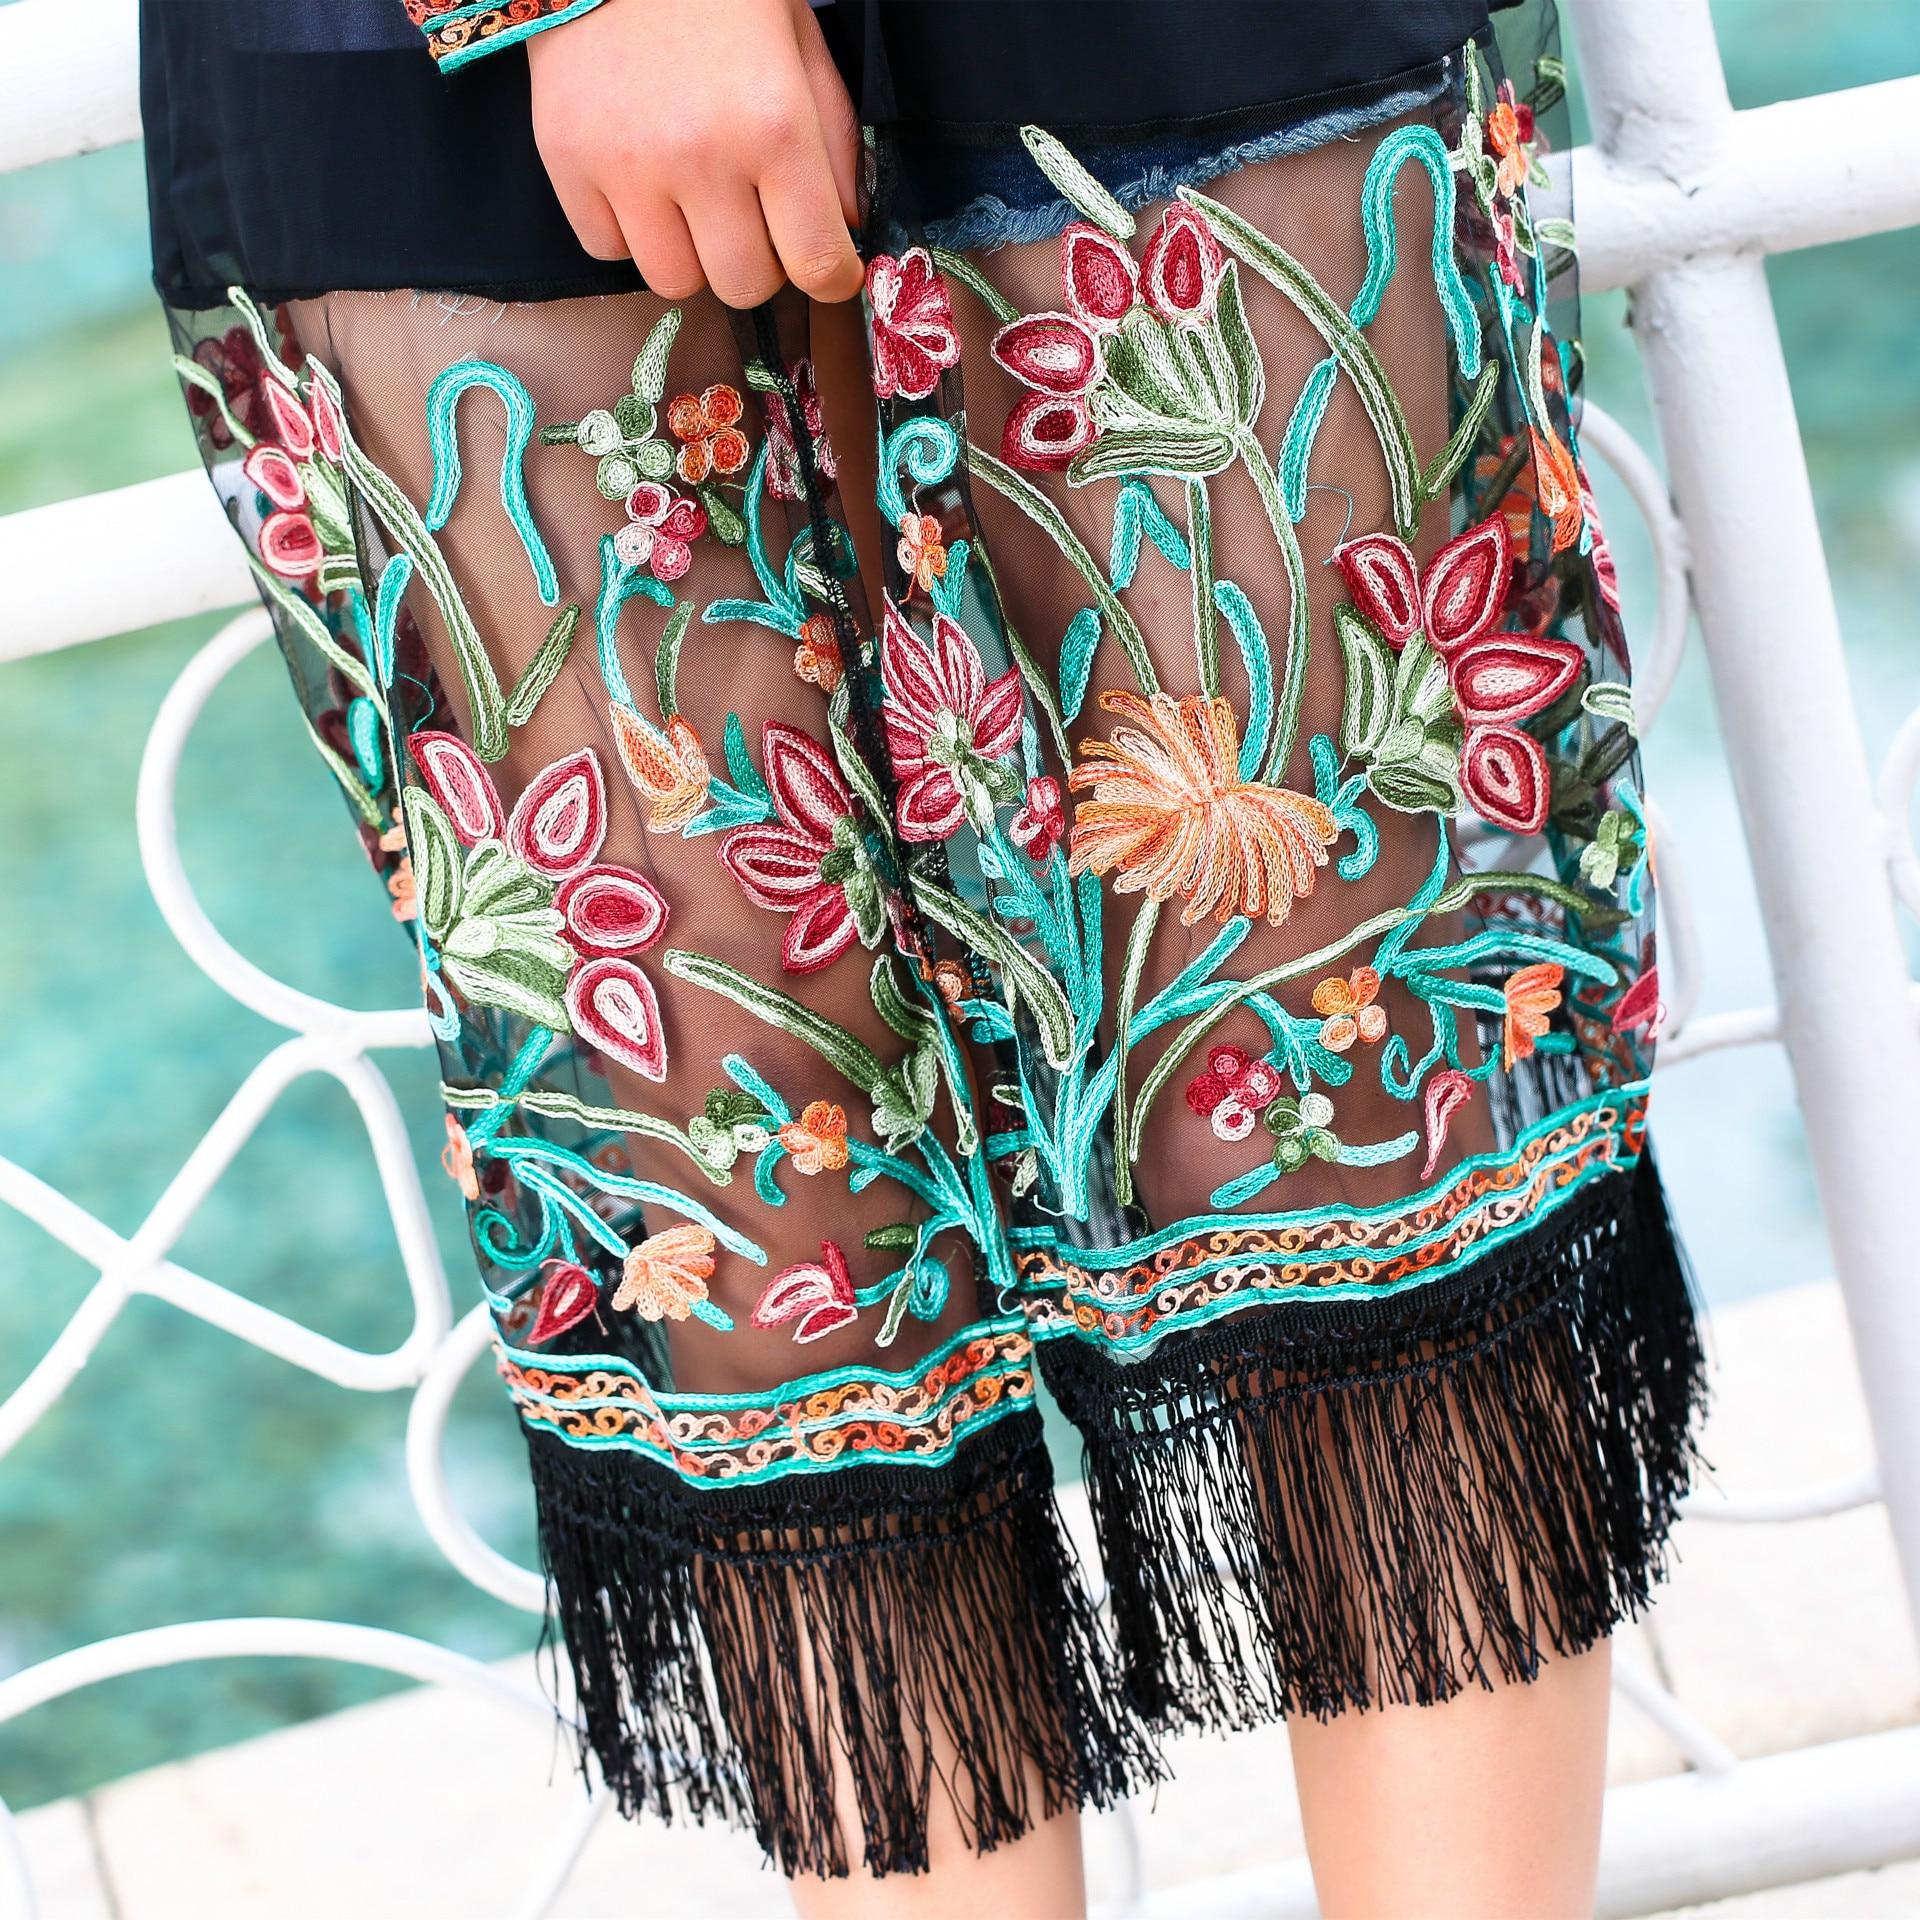 a4d9bdb47 2016 Summer long chiffon shirts Fringe Kimono women embroidery transparent  mesh blouse lady Sunscreen shirt long beach blouse-in Blouses & Shirts from  ...